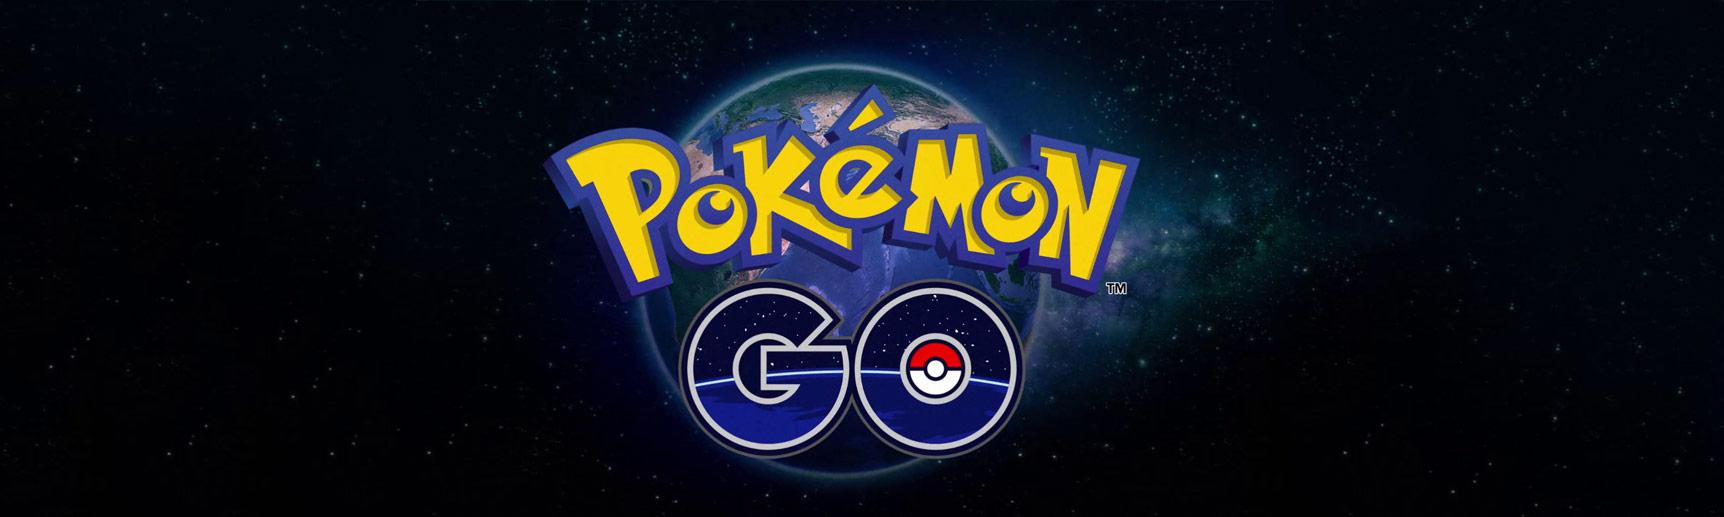 Kelowna Marketing - Pokemon Go for Small Business